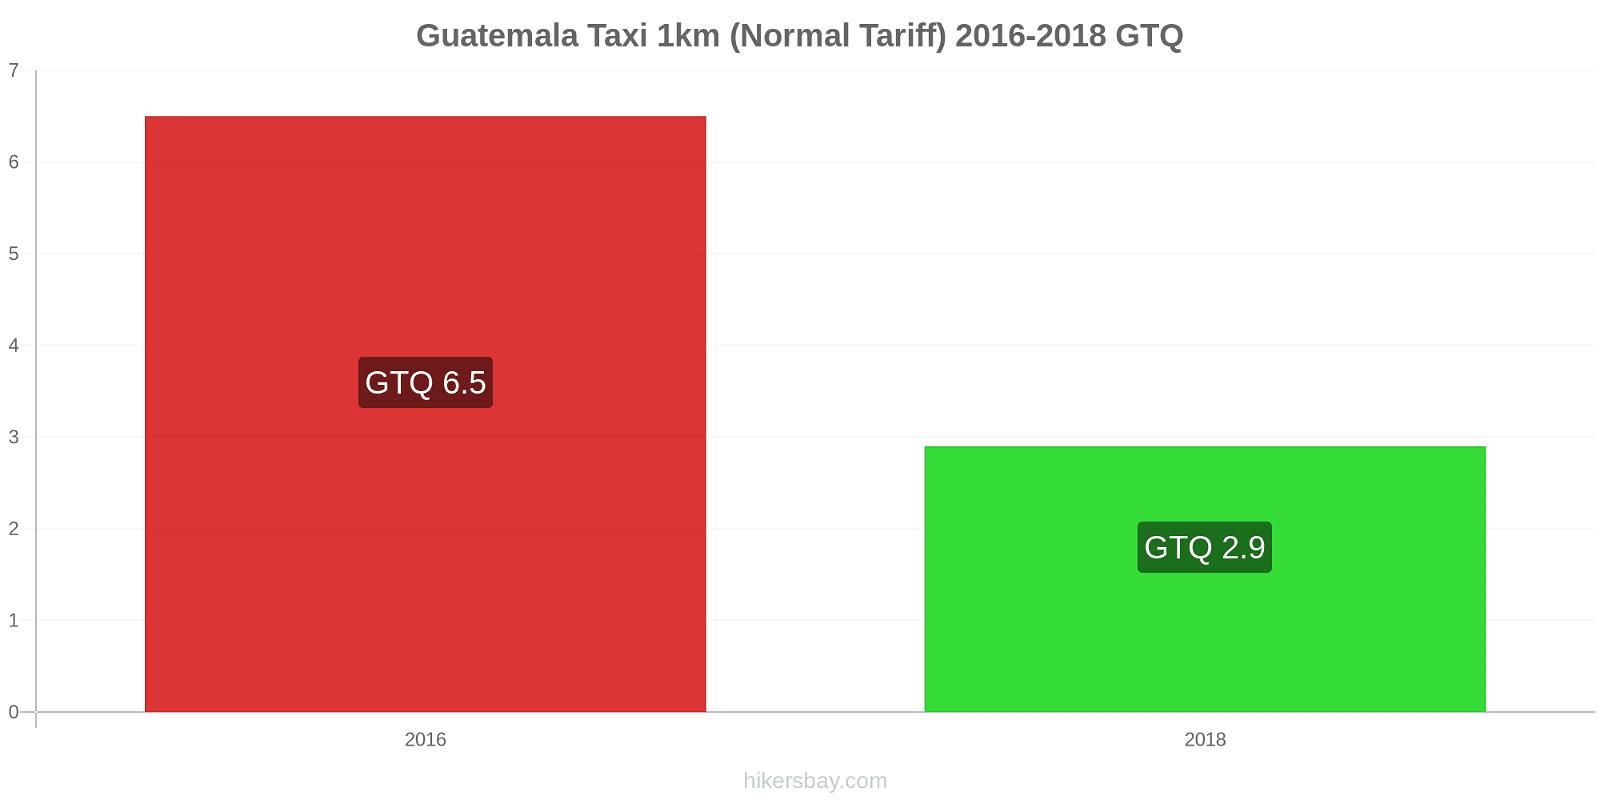 Guatemala price changes Taxi 1km (Normal Tariff) hikersbay.com